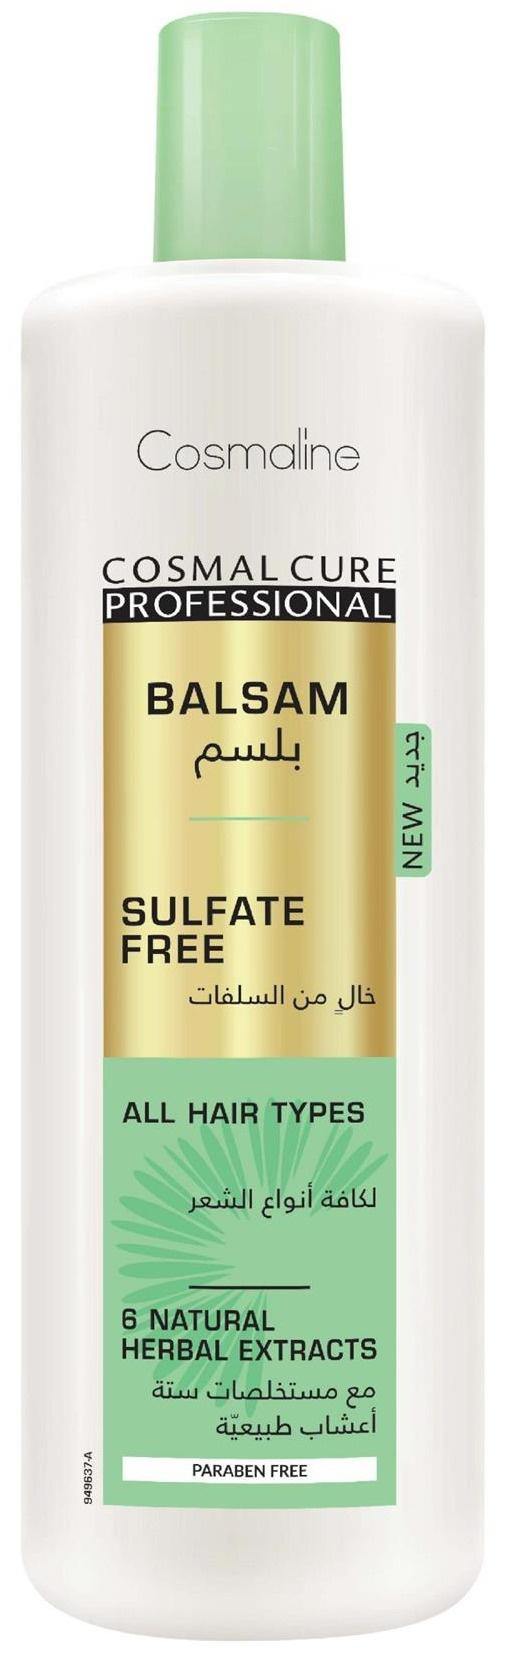 Cosmaline Cosmal Cure Professional Sulfate Free Balsam